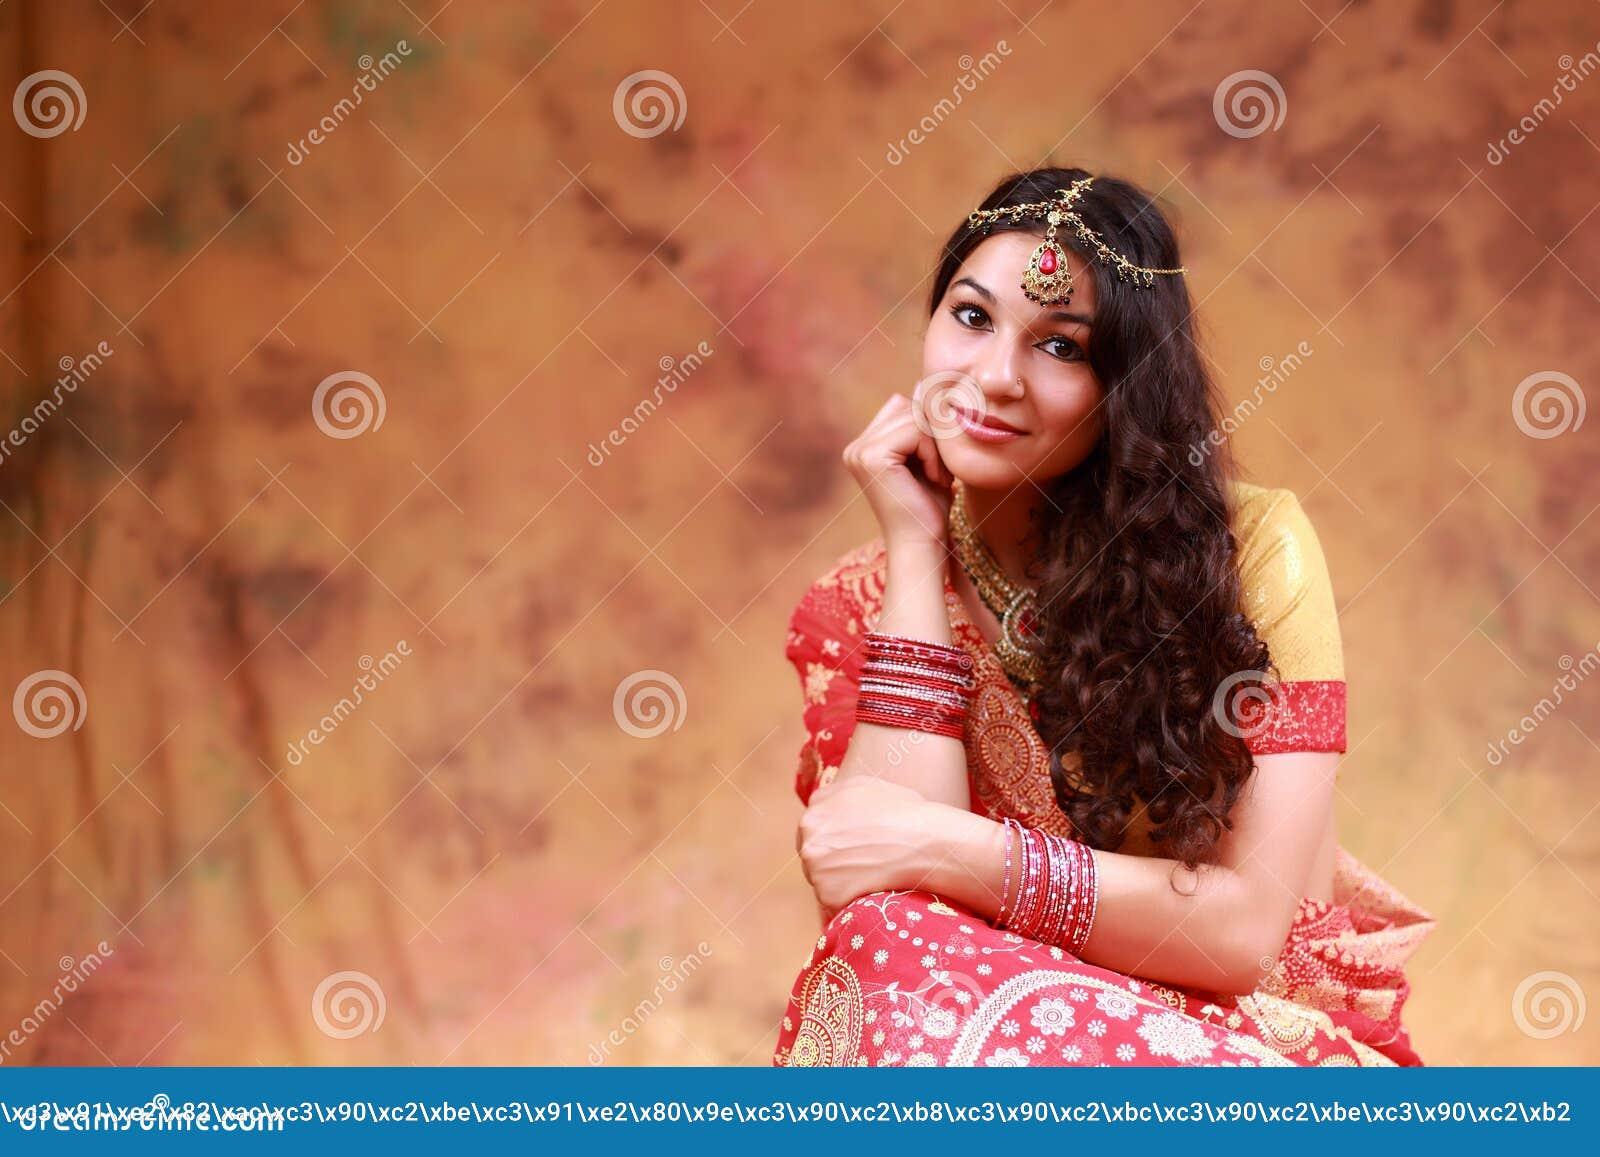 a4f5e26bfa Beautiful Indian girl stock image. Image of asian, bride - 77986651